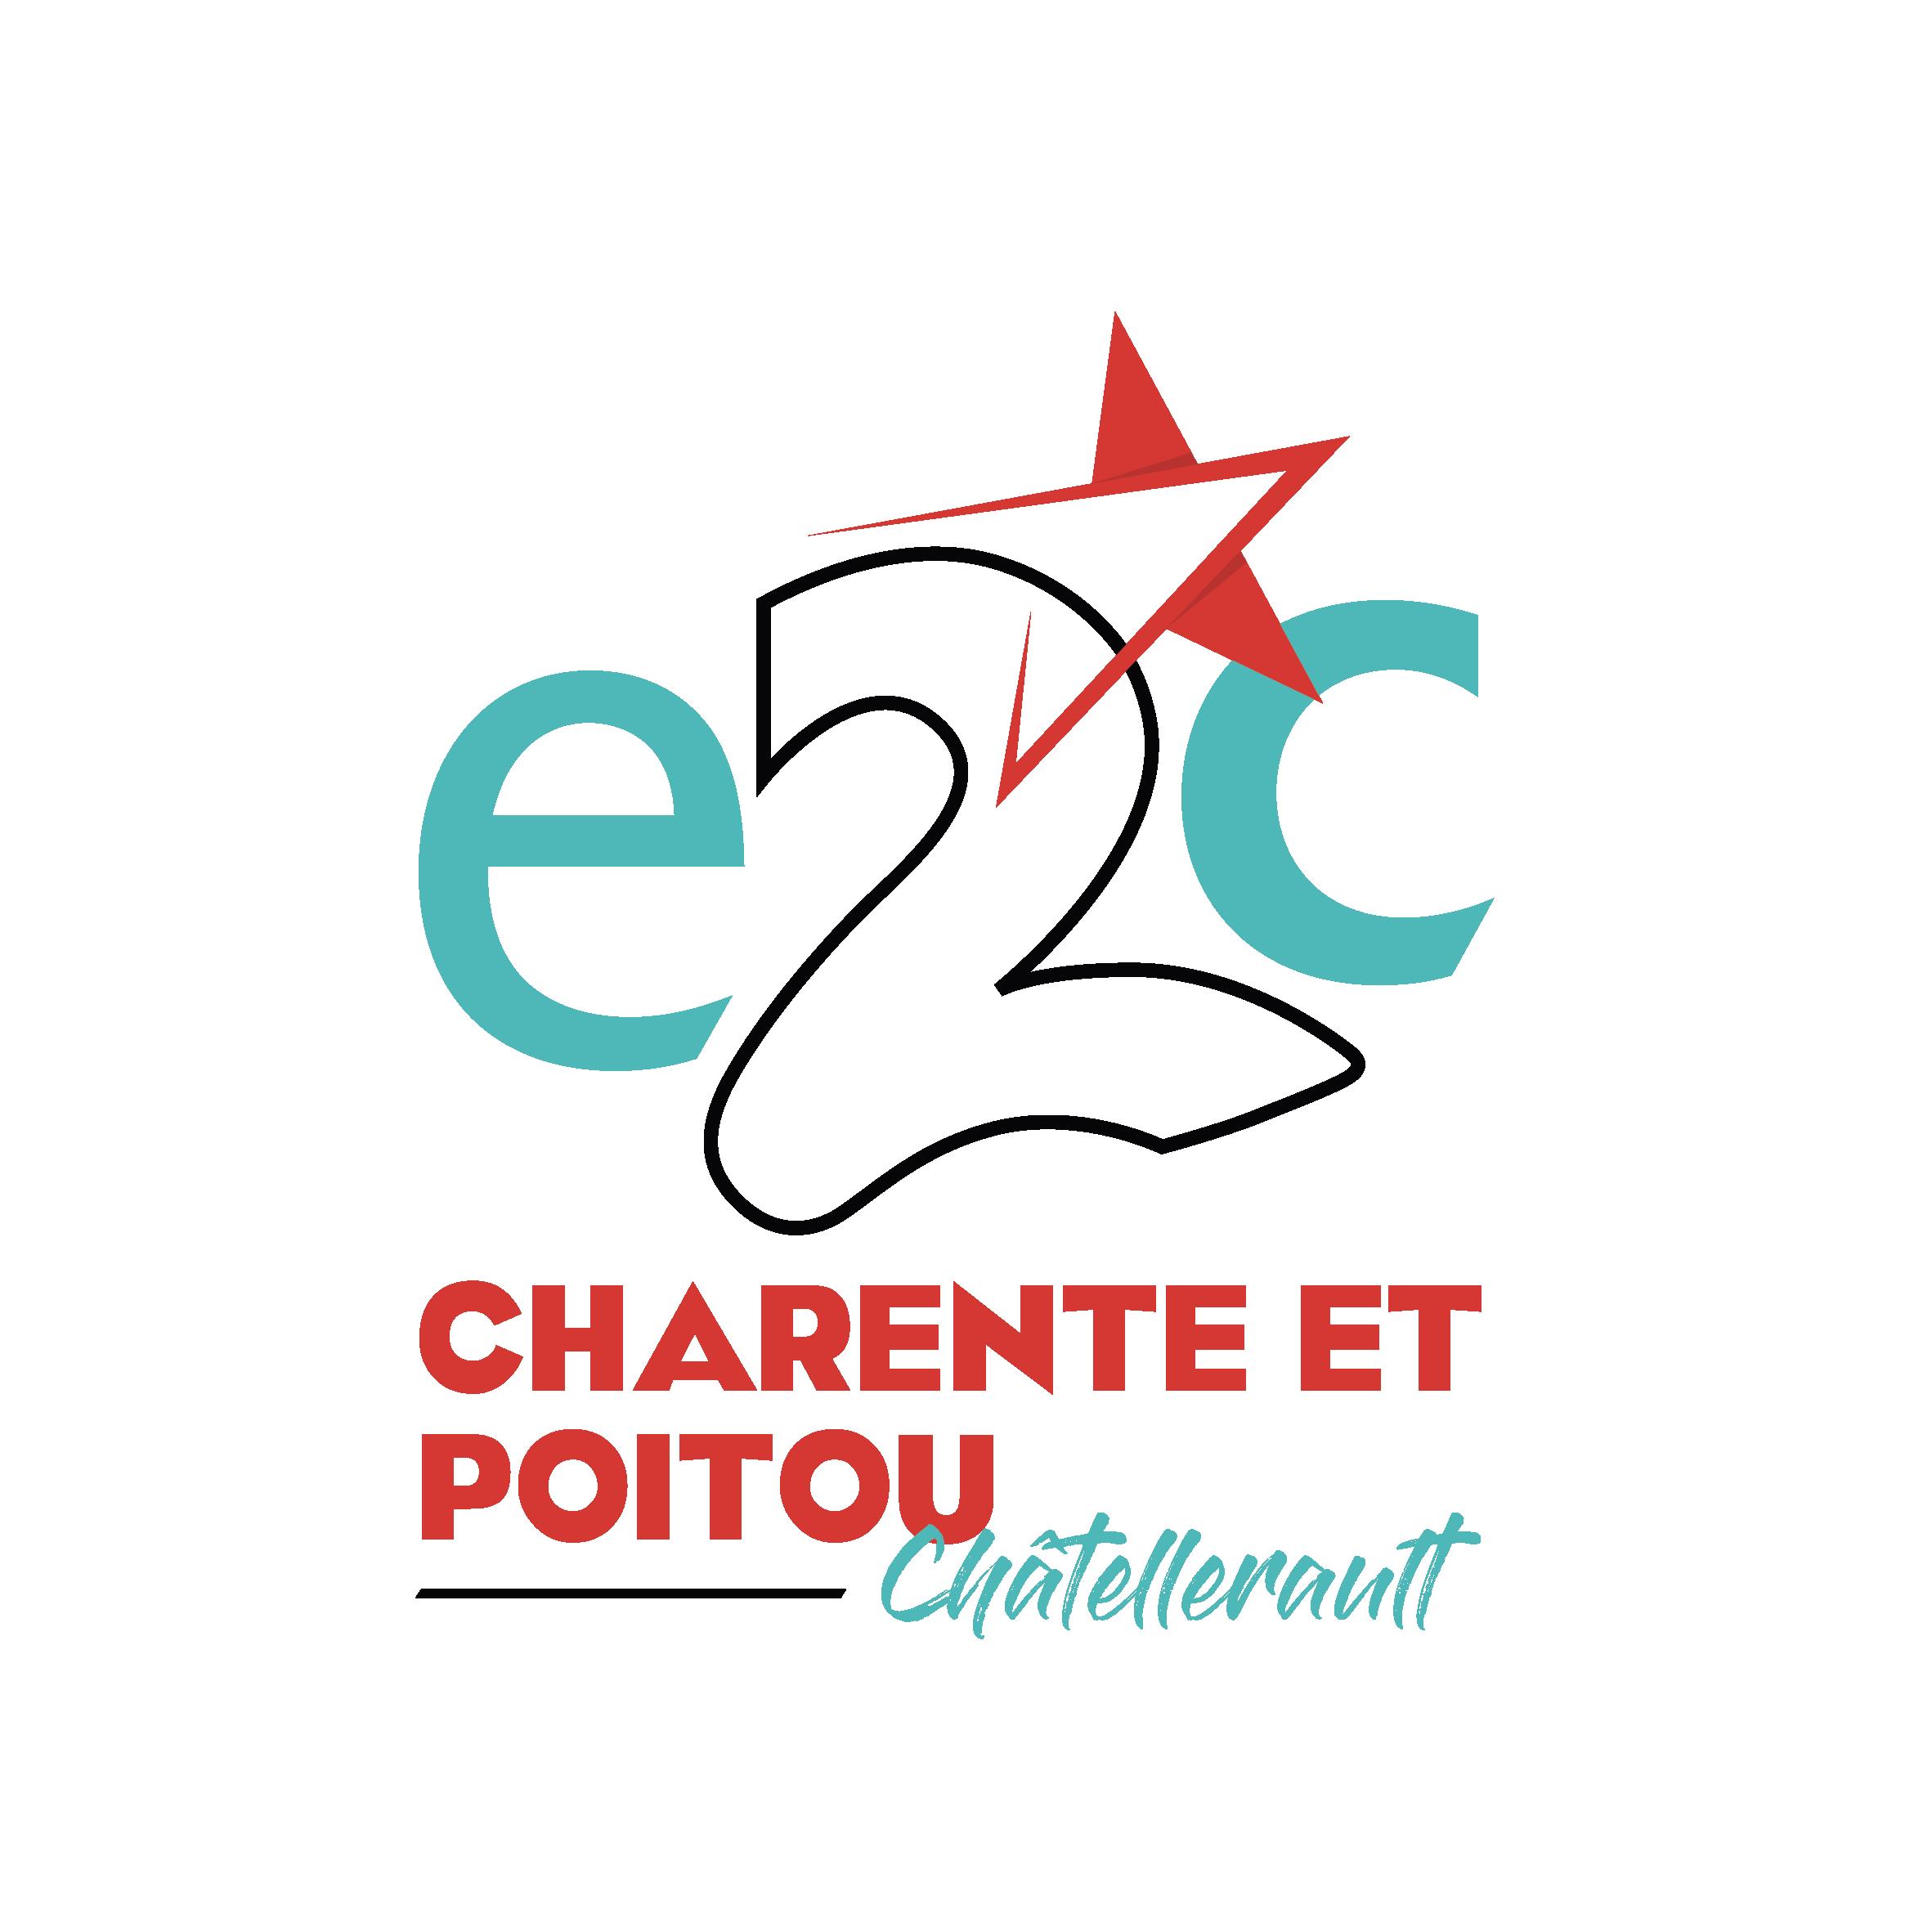 E2C CHÂTELLERAULT